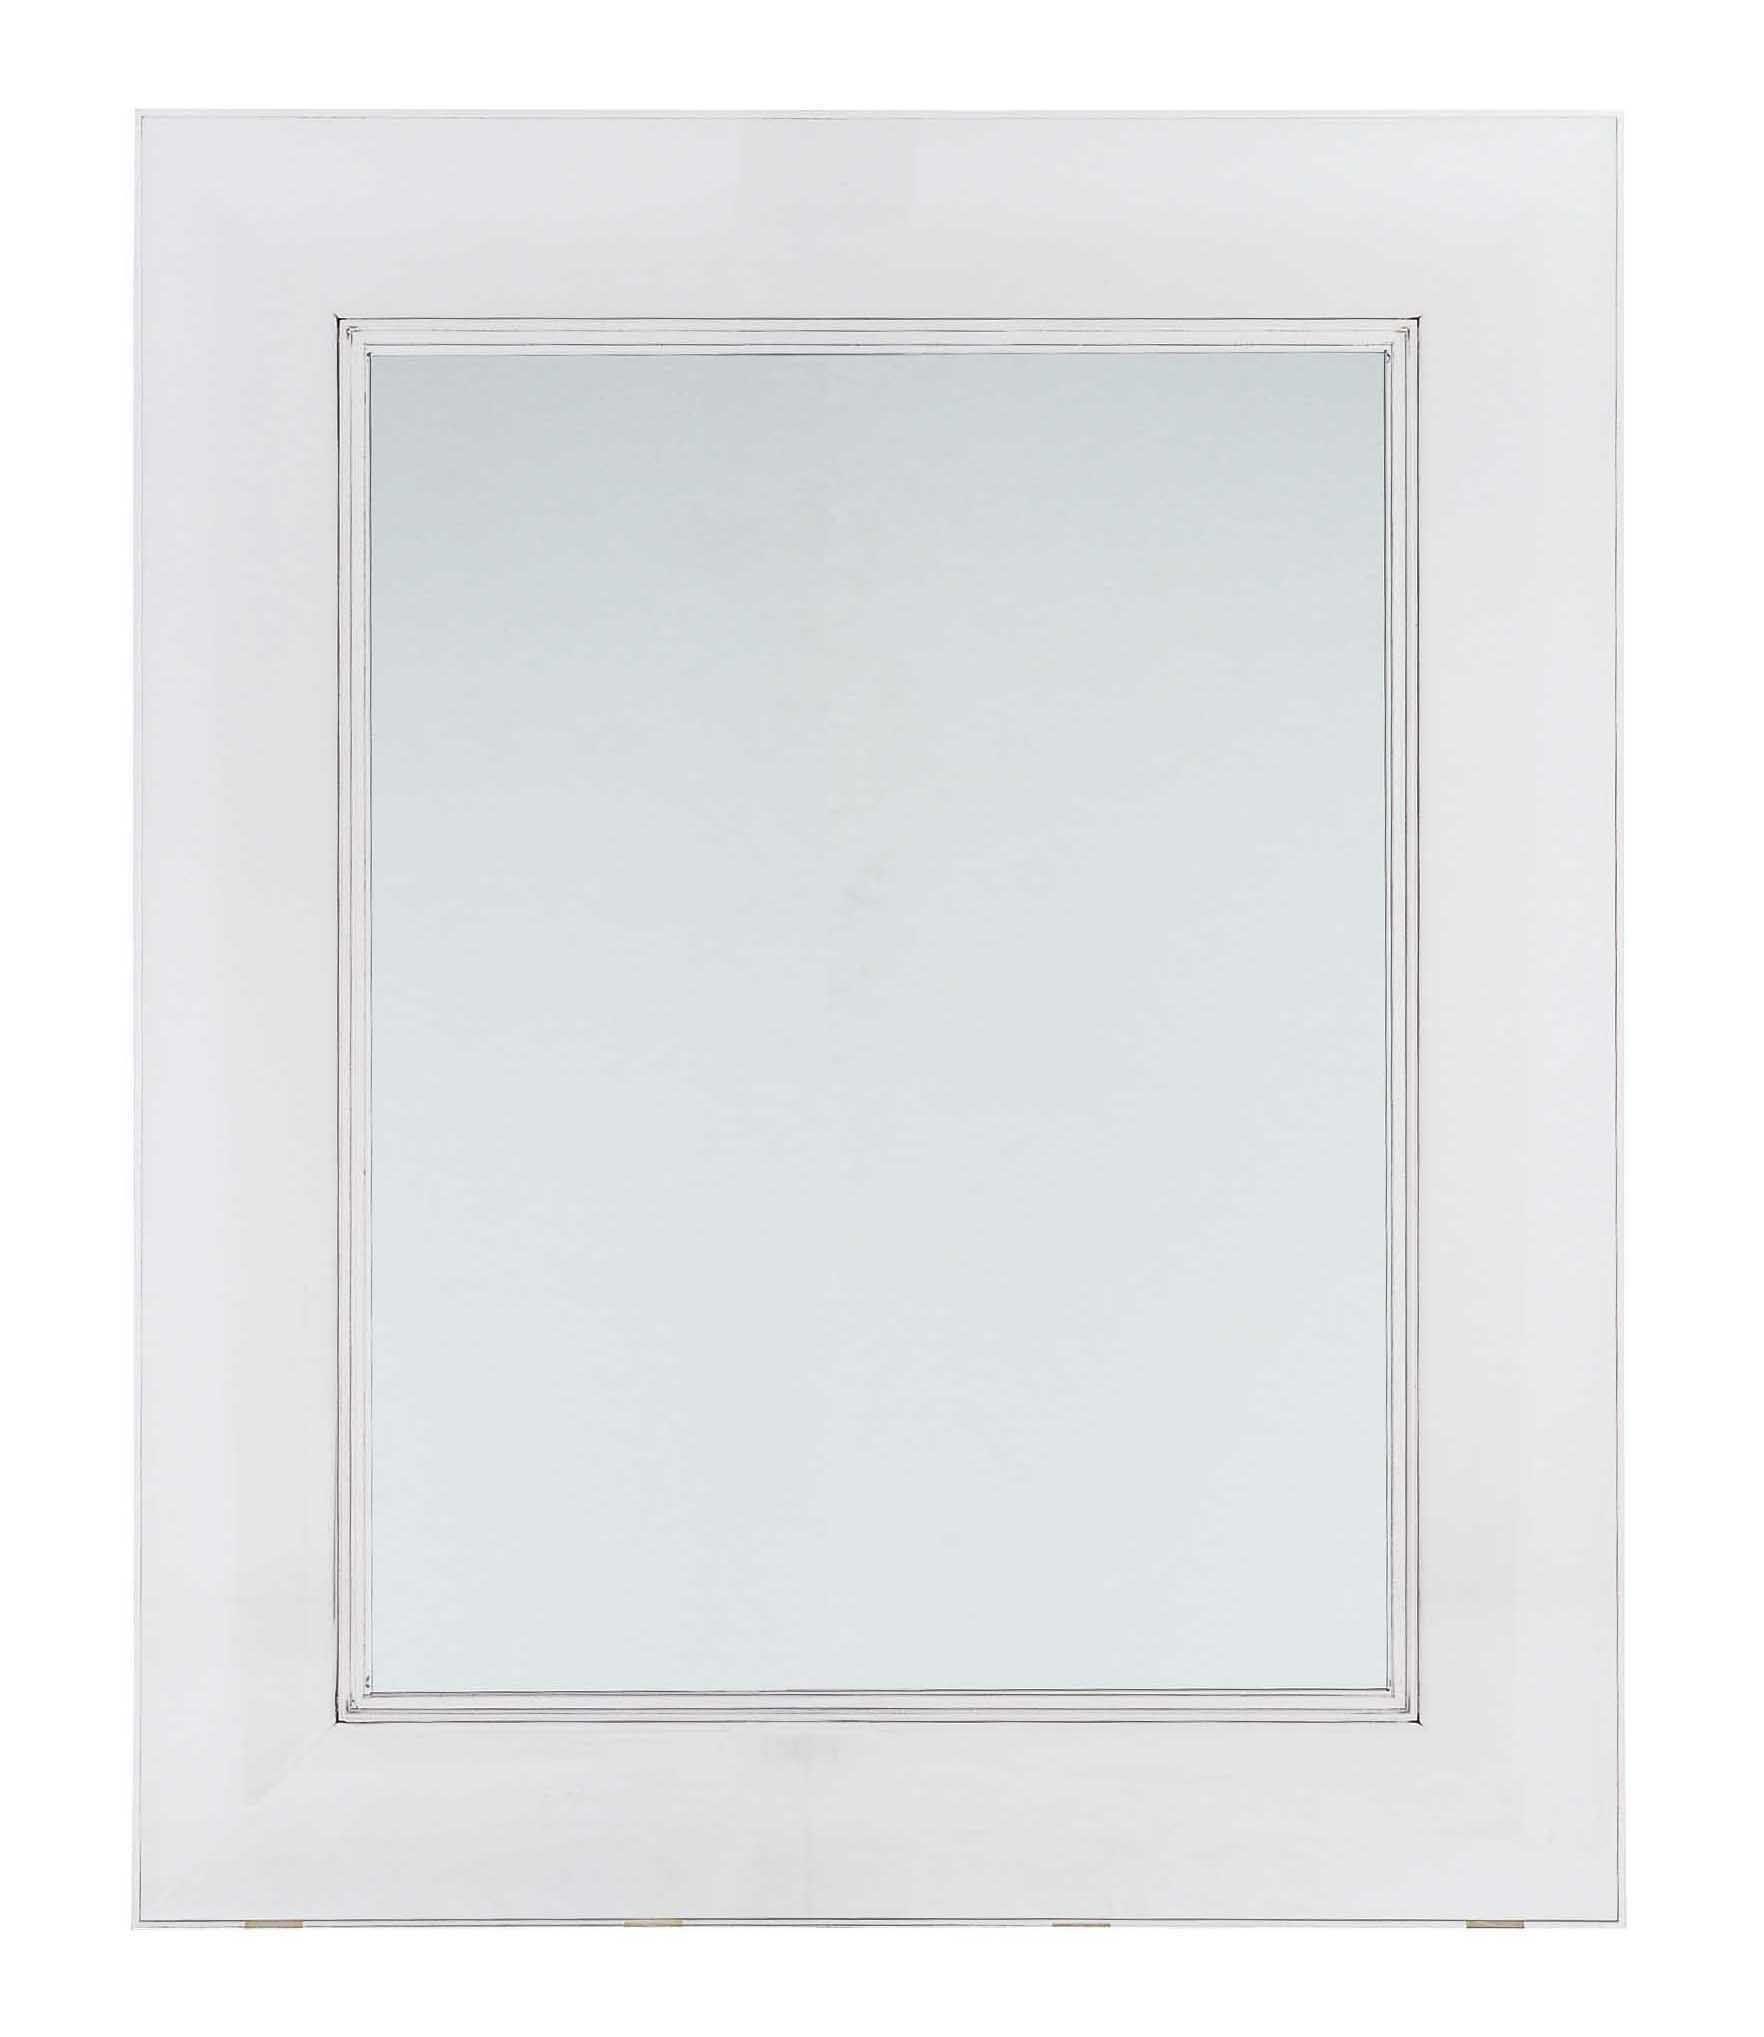 Möbel - Beistell-Möbel - Francois Ghost Wandspiegel 65 x 79 cm - Kartell - Kristall - Polykarbonat